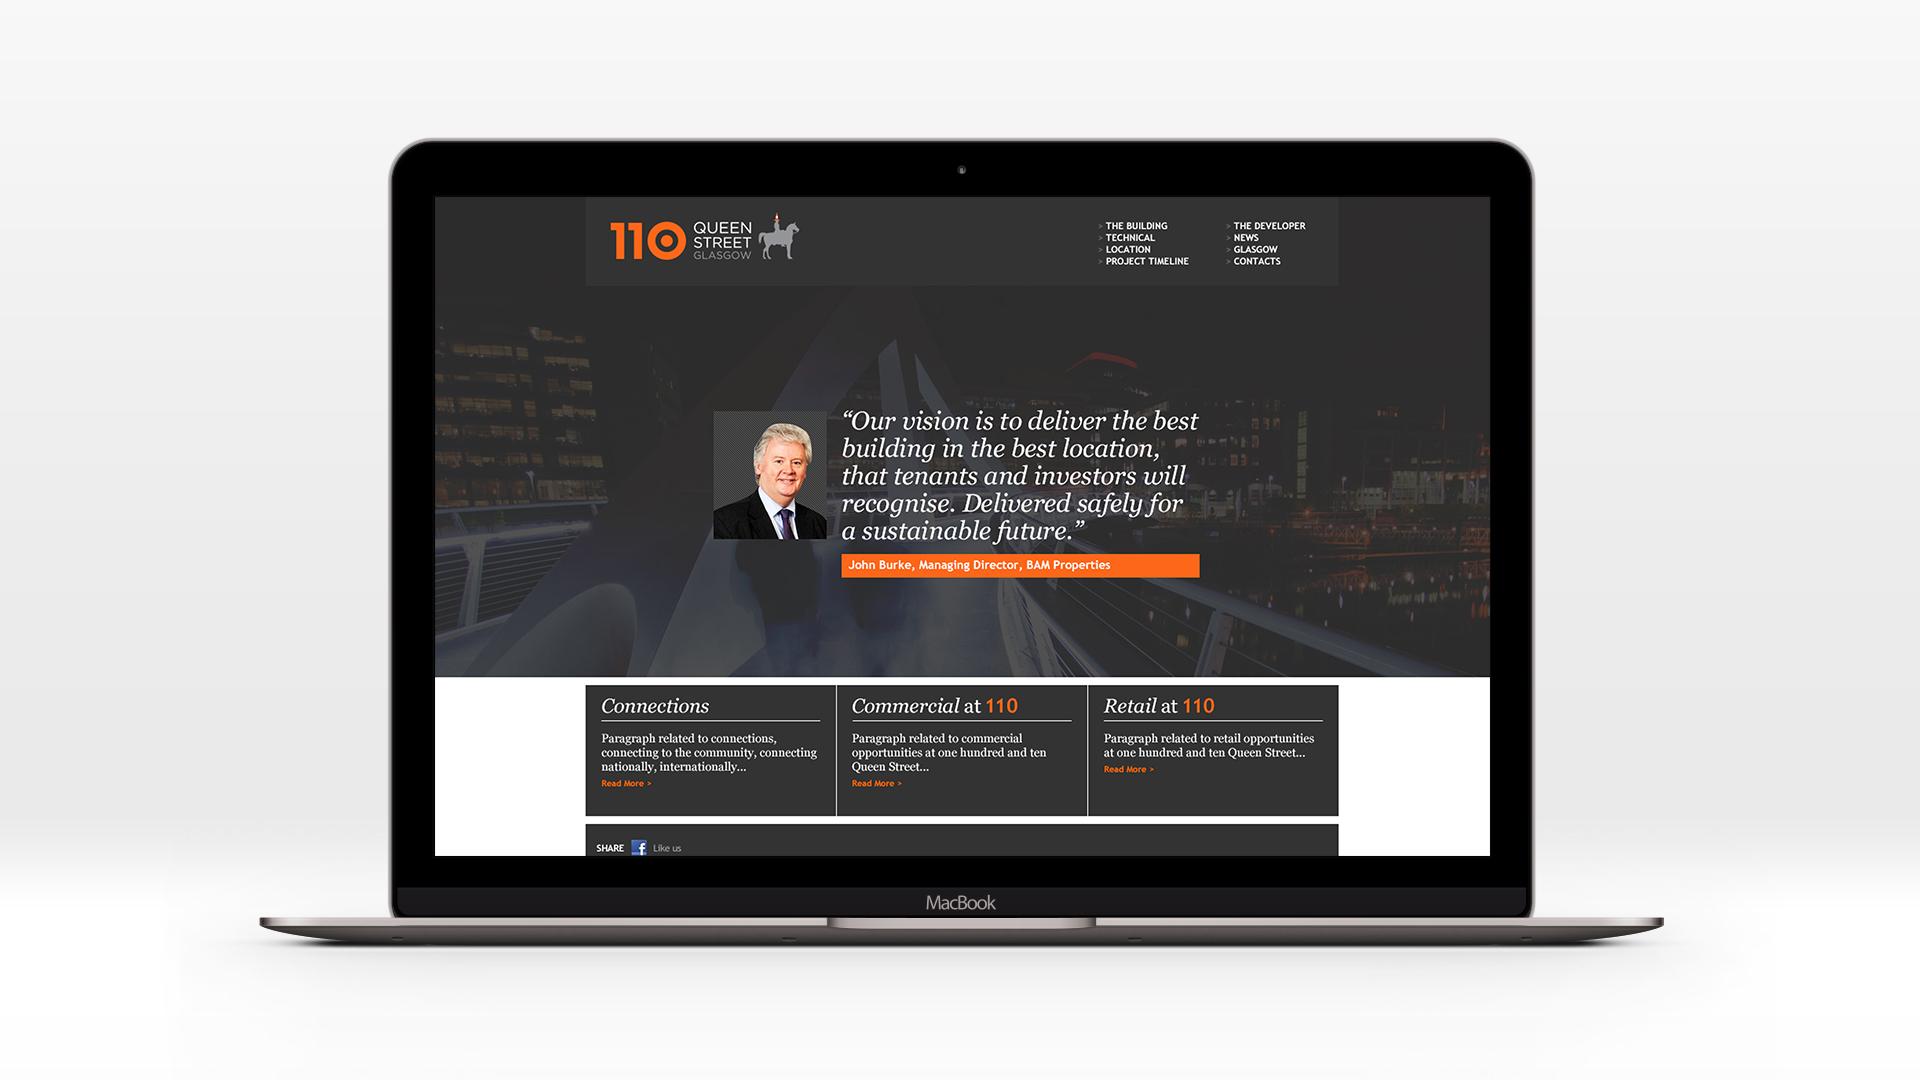 openagency_bam-brand_1920x1080_website_1